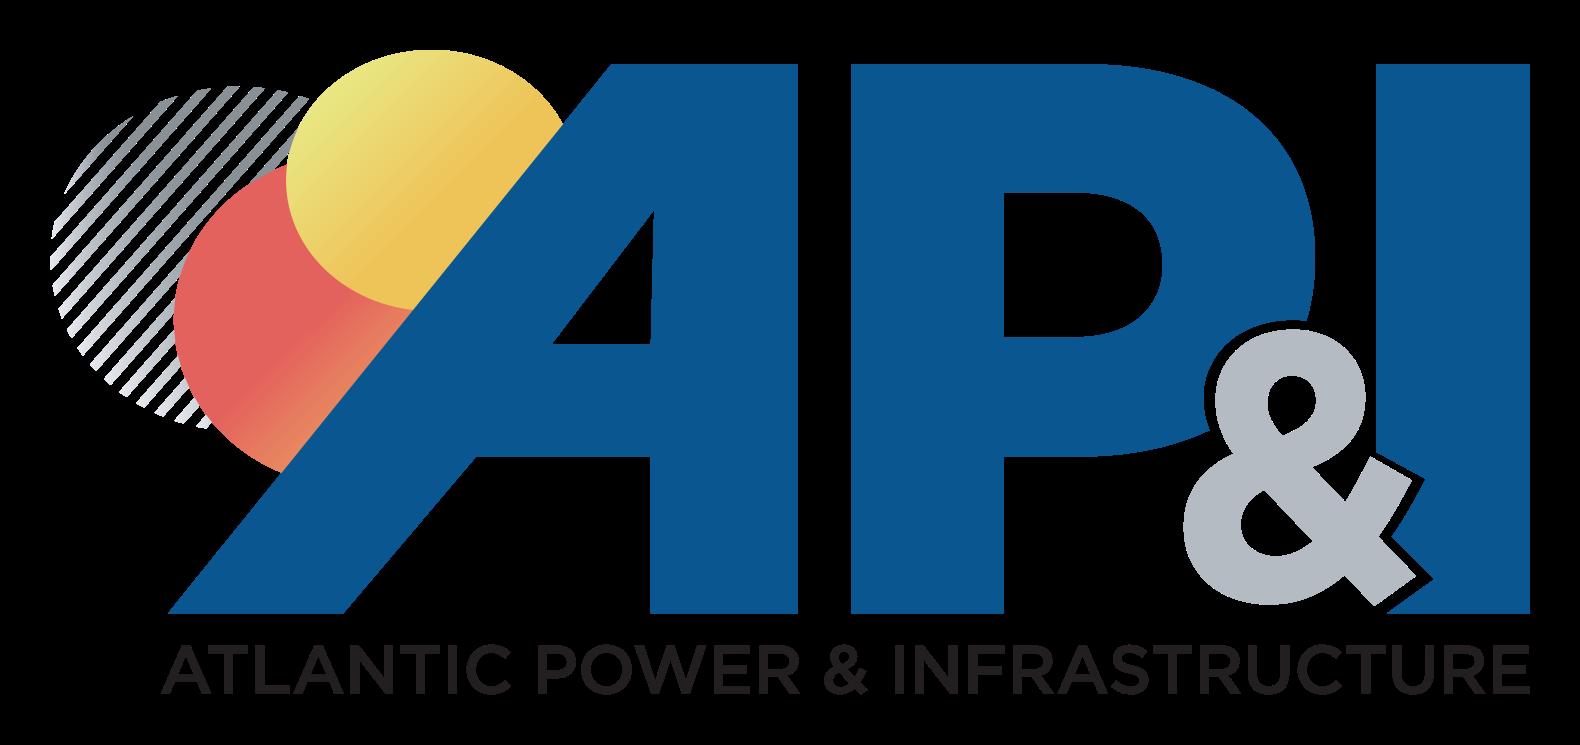 Atlantic Power & Infrastructure Inc.